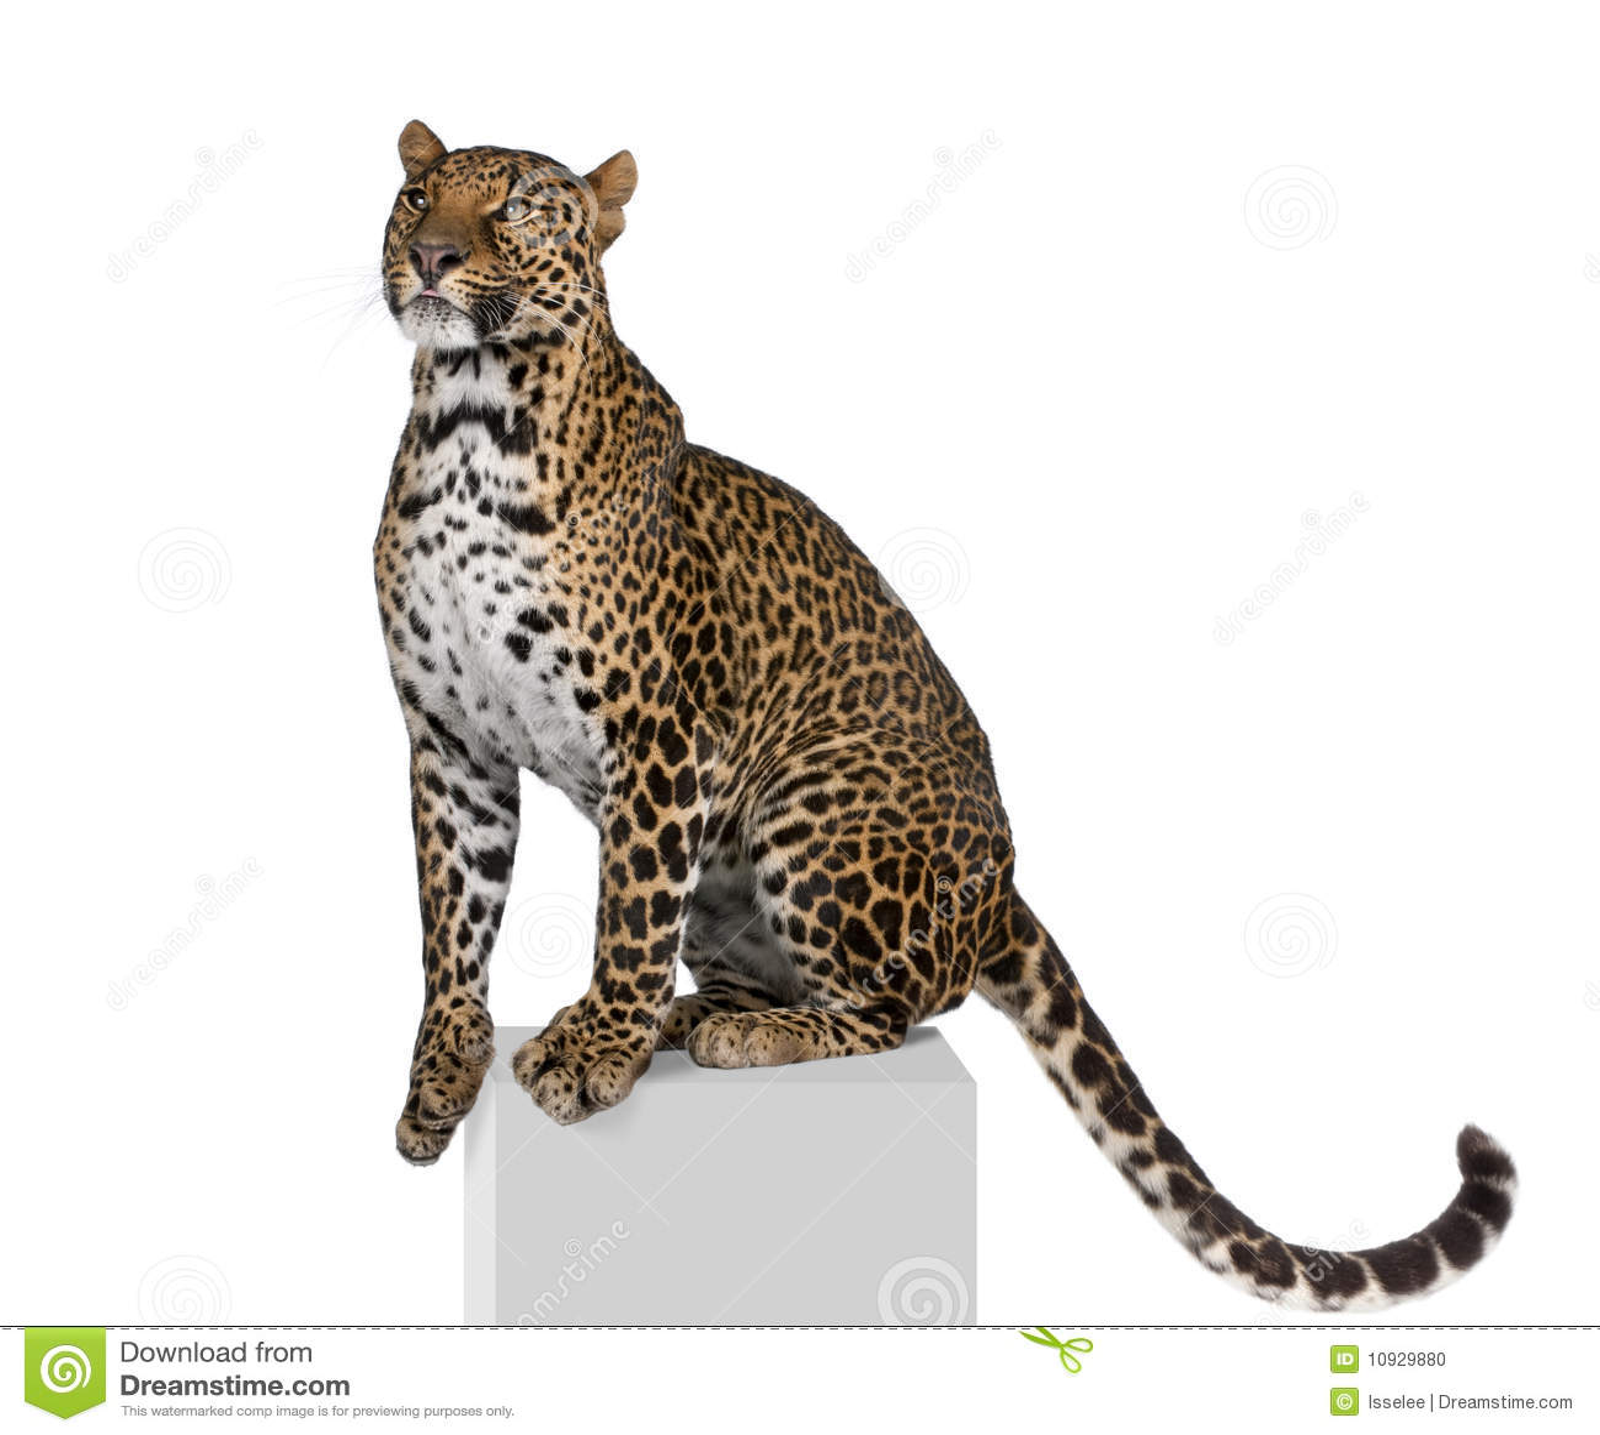 Big Cheetah Looking Cat